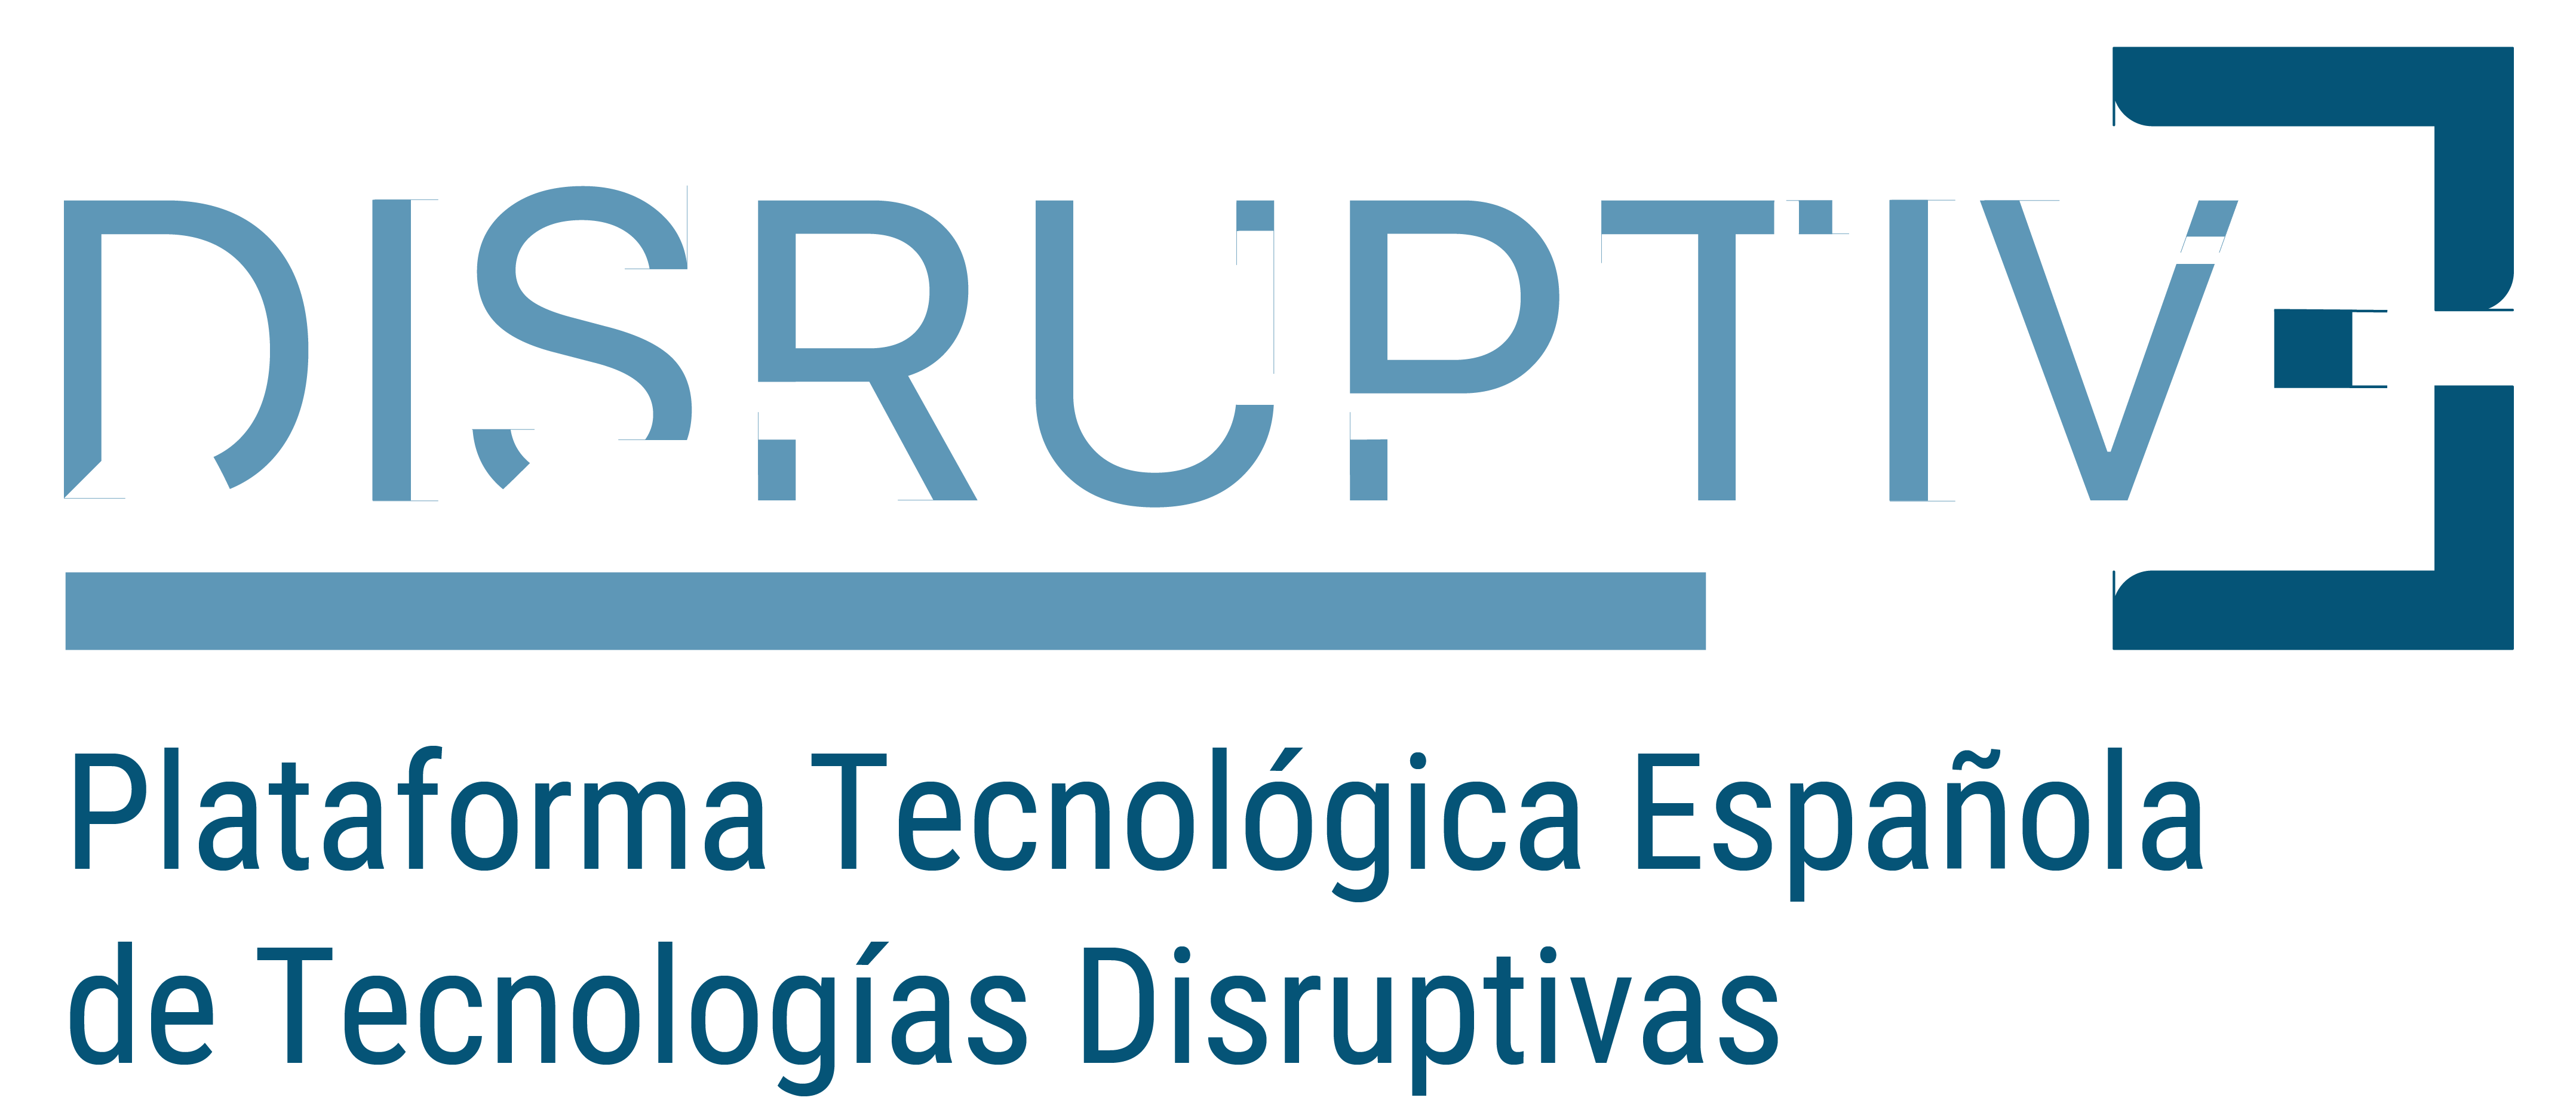 PTE Disruptive